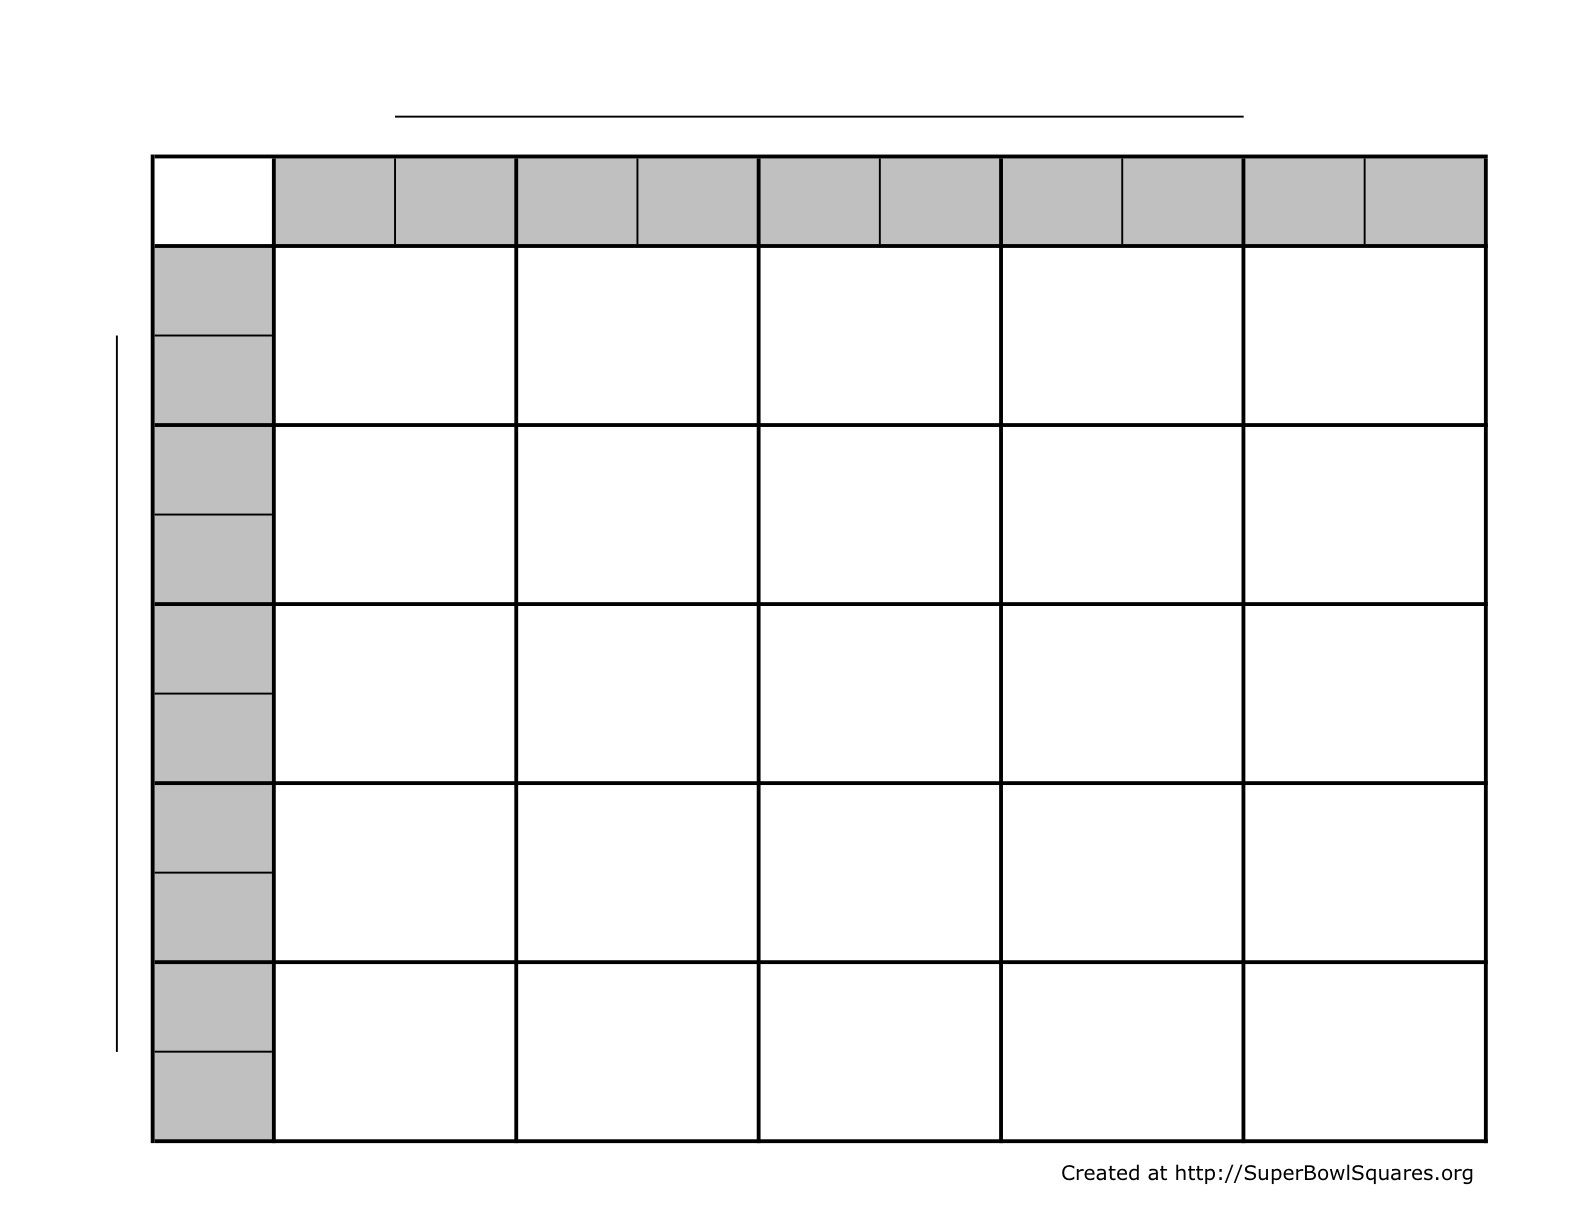 005 Wonderful Football Square Template Excel Image  Printable PoolFull